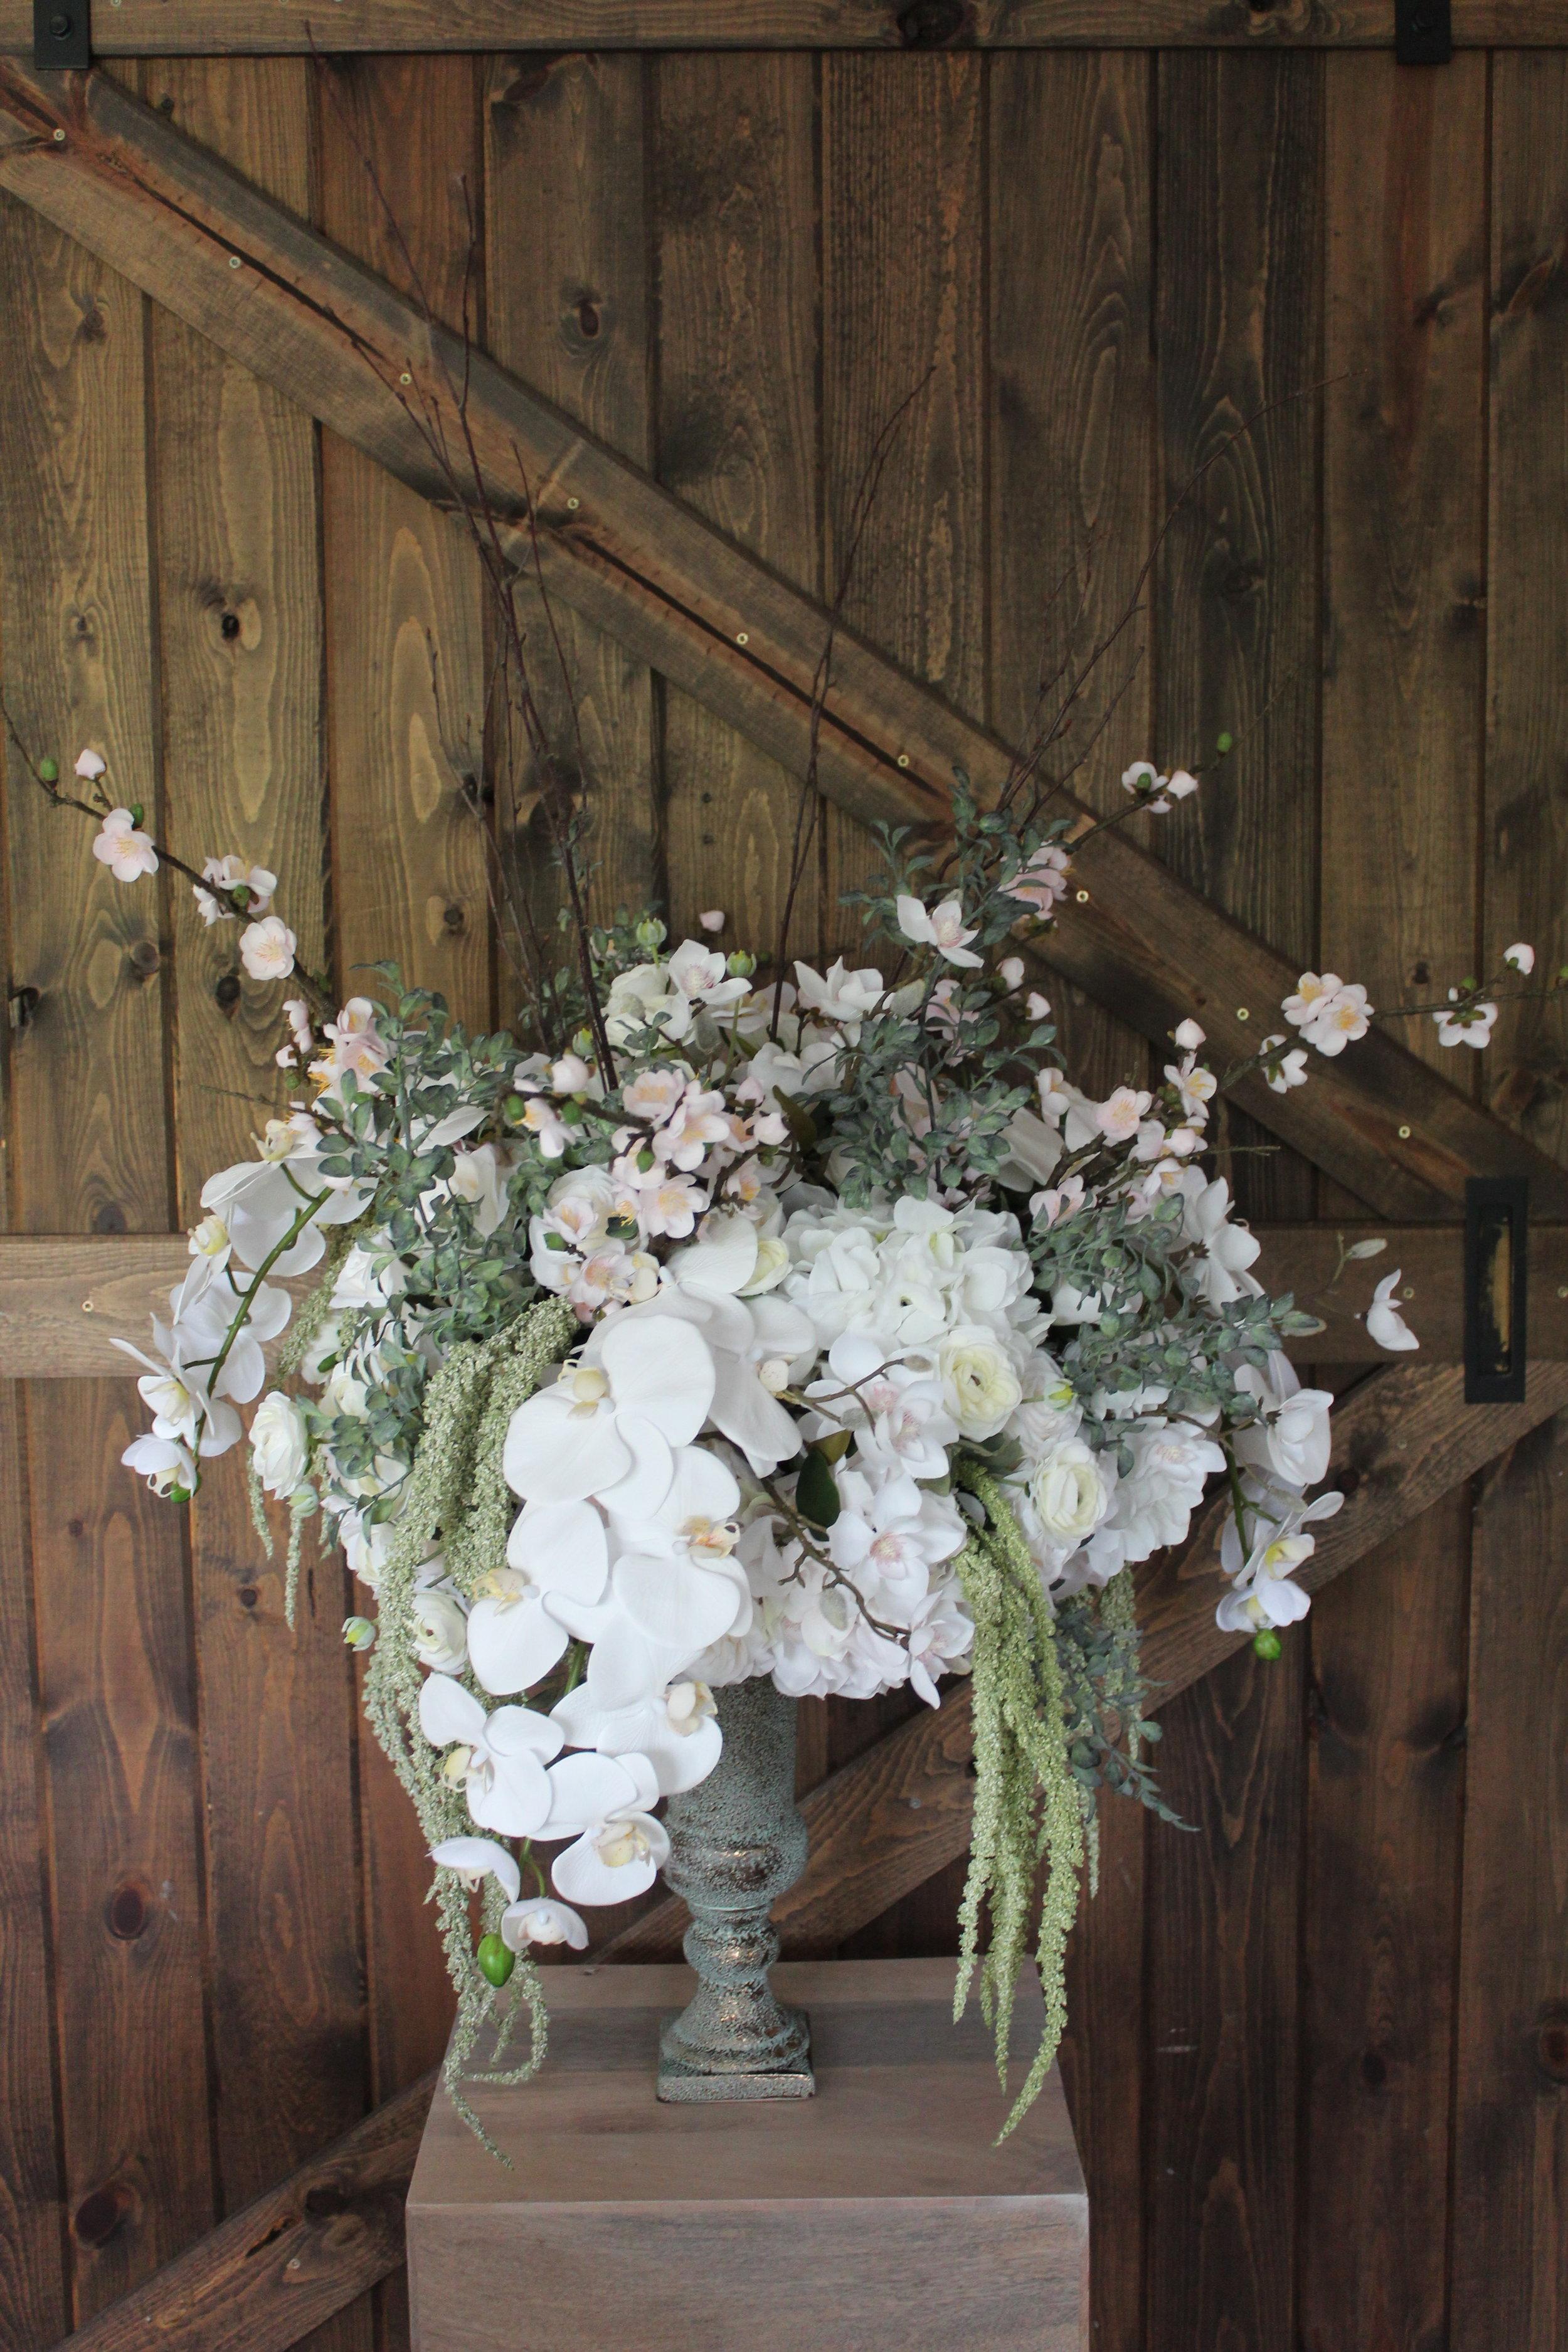 silk-wedding-flowers-custom-centerpiece-bridal-bouquets.jpg